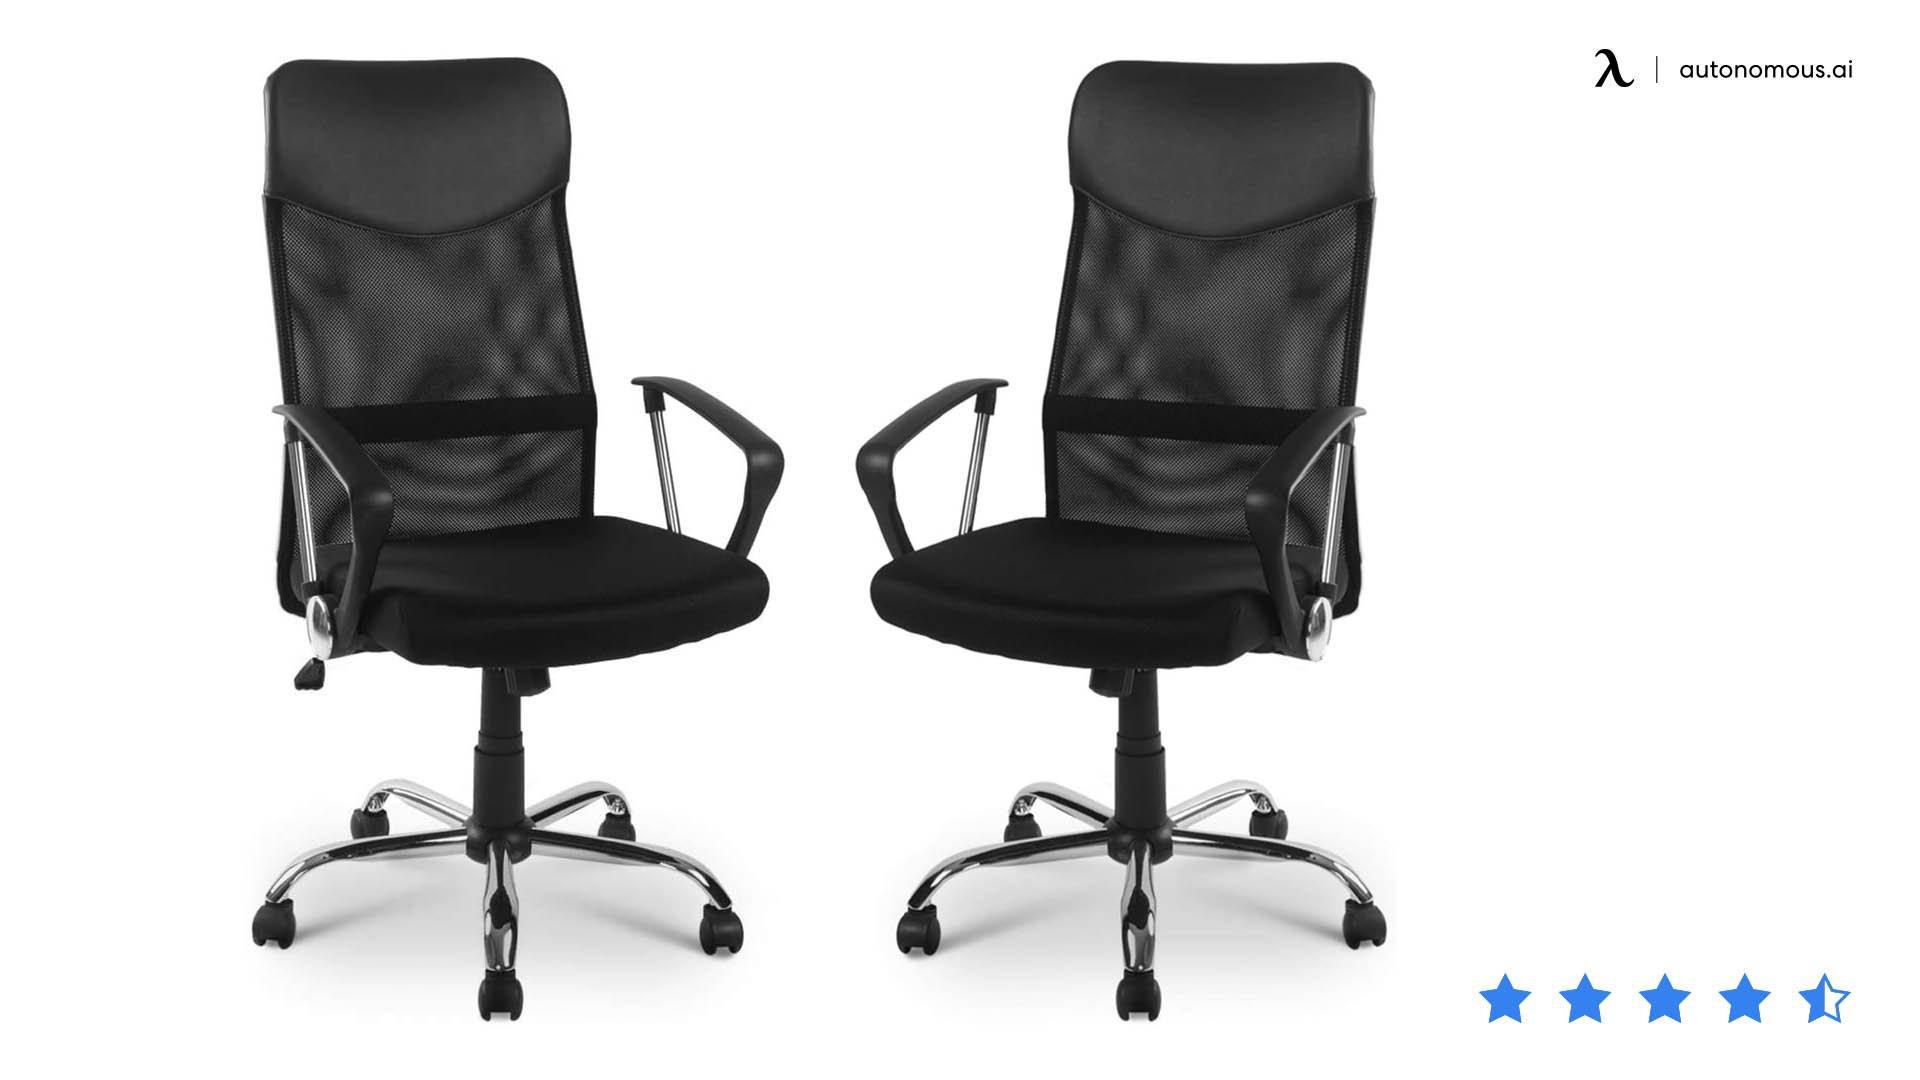 ACVCY Ergonomic Office Chair